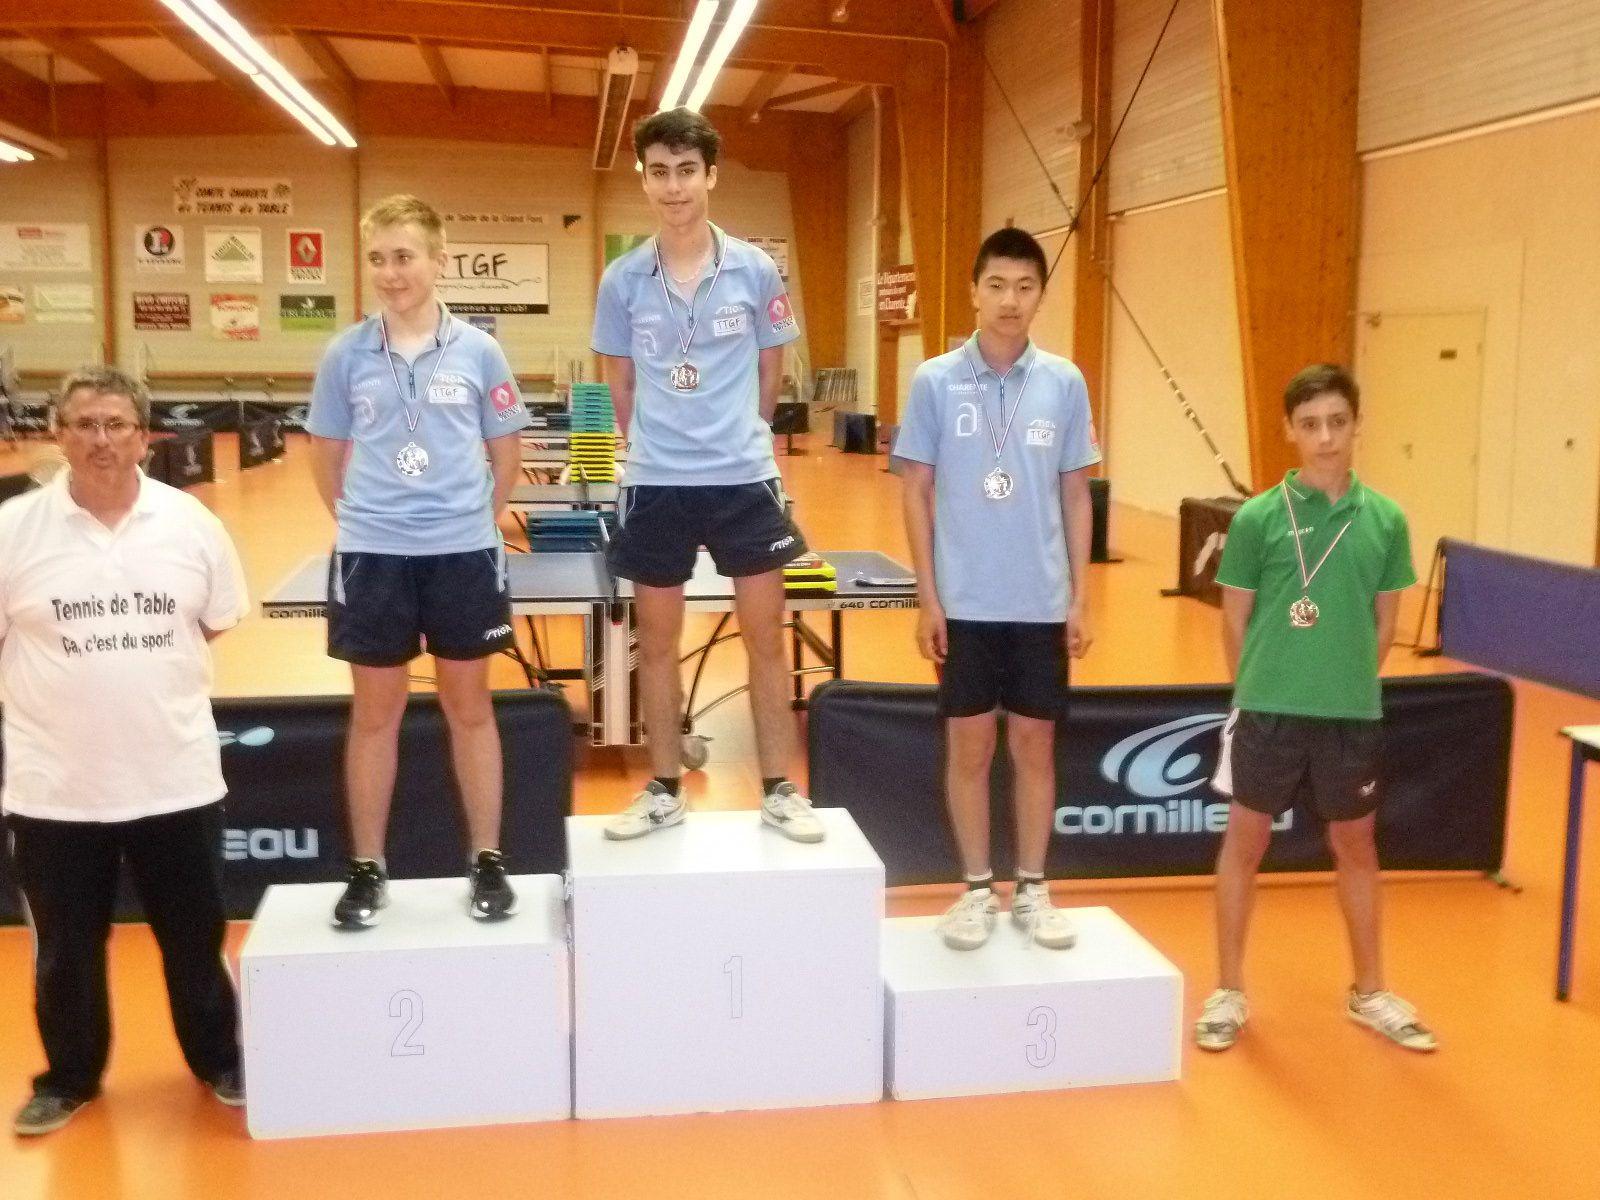 benjamins:Théau/Sacha&#x3B;minimes&#x3B;Samuel/Hugo&#x3B;cadets&#x3B;Damien/Nathan/Léon,une partie du club!